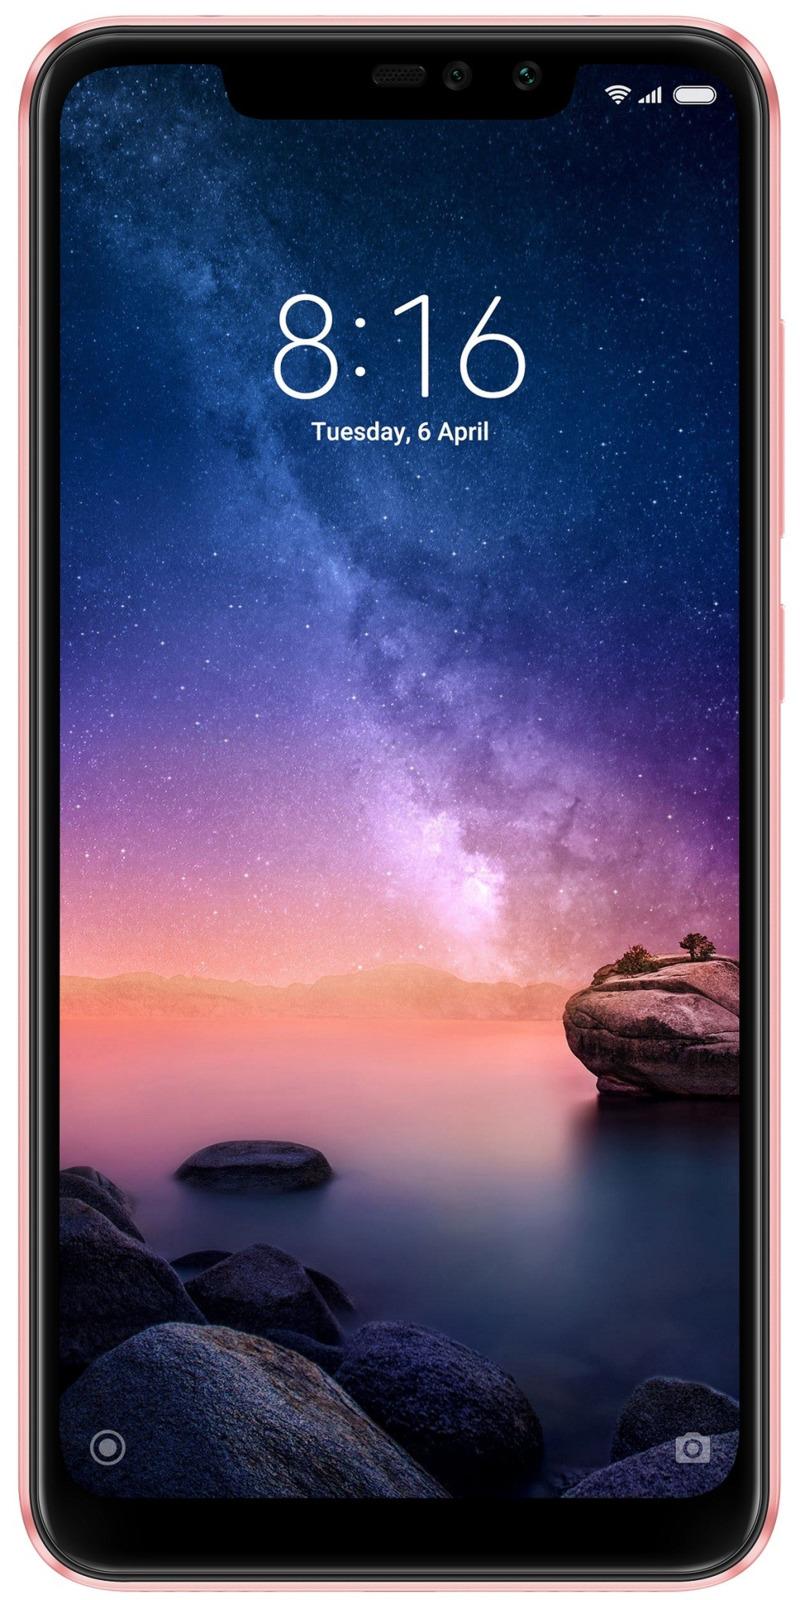 Смартфон Xiaomi Redmi Note 6 Pro 4/64GB pink gold компьютерные аксессуары oem 5pcs ipad wifi 3g gps